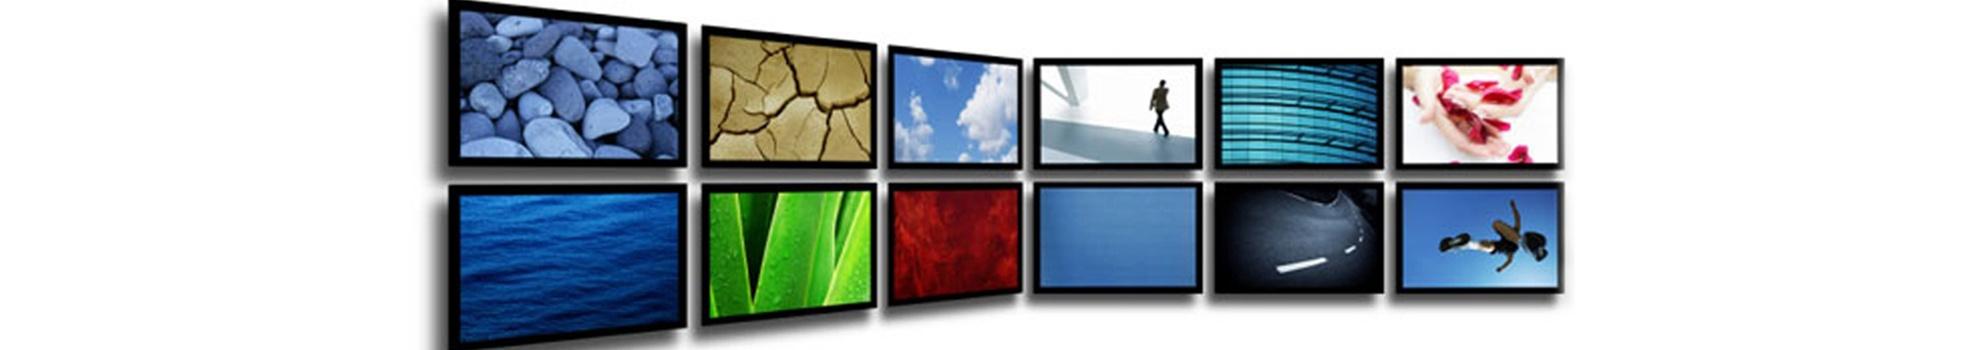 IPS_Industries_AdvertisingMedia_Banner